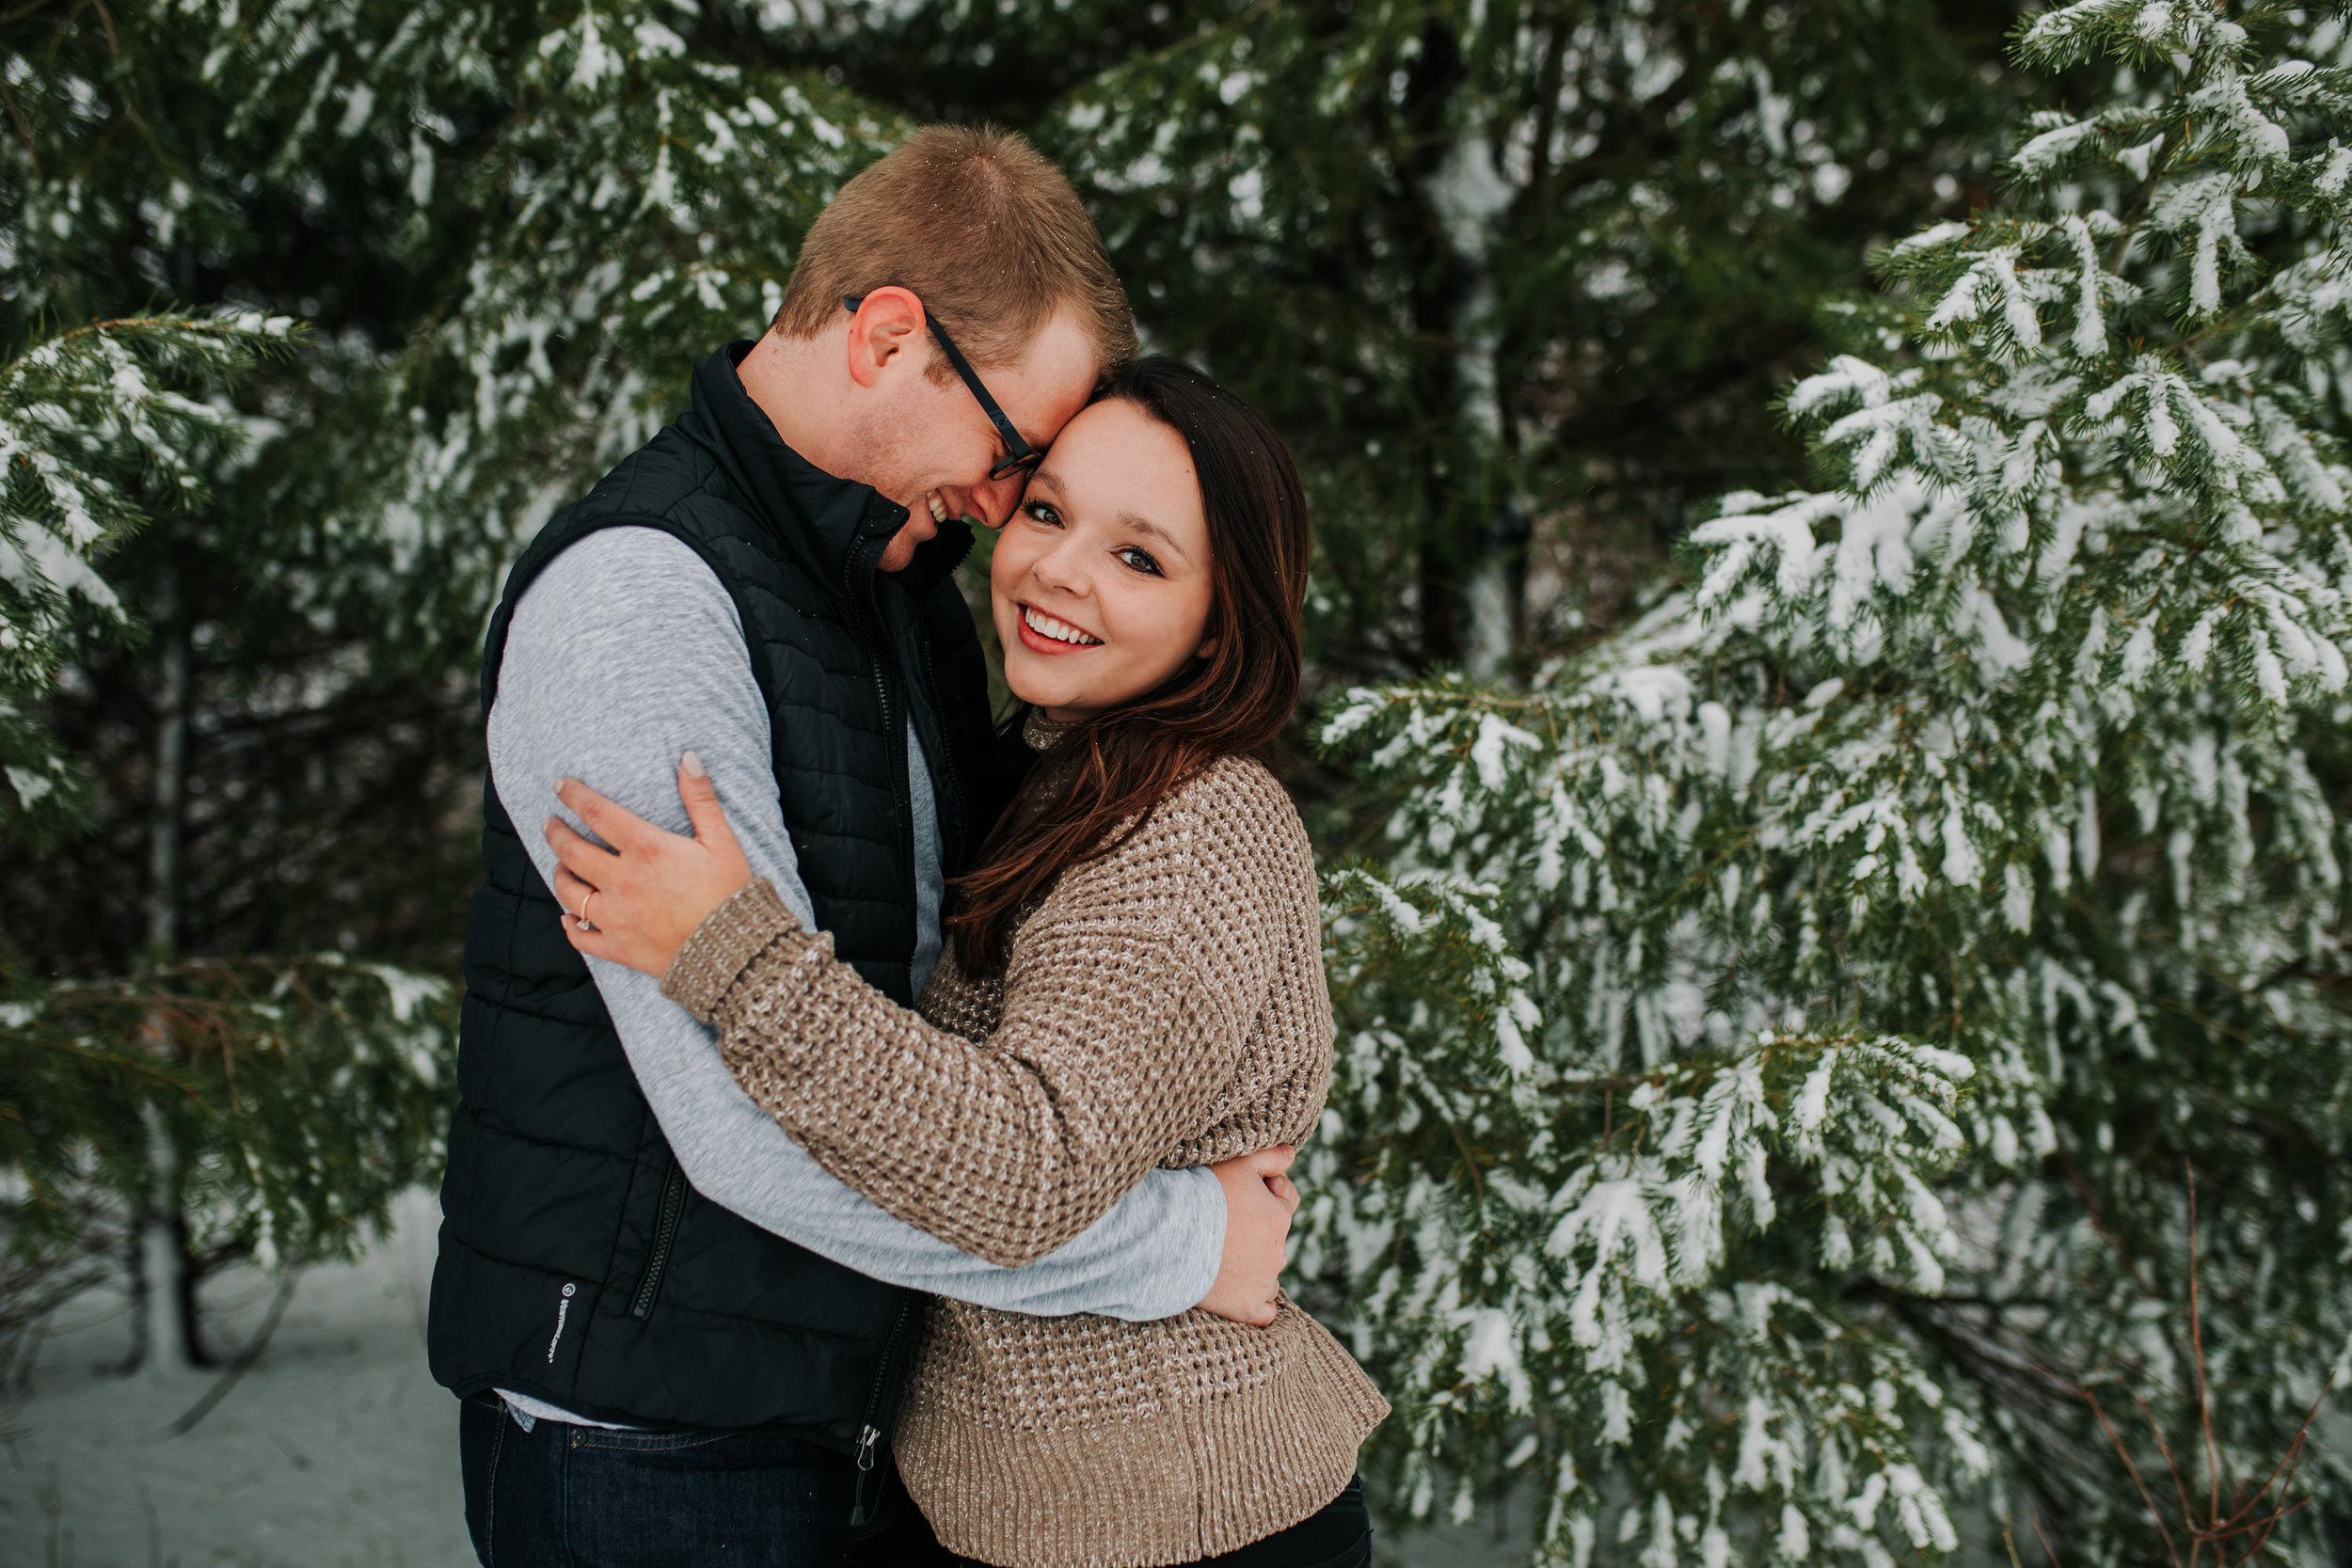 Vanessa & Dan - Engaged - Nathaniel Jensen Photography - Omaha Nebraska Wedding Photographer - Standing Bear Lake - Snowy Engagement Session-40.jpg